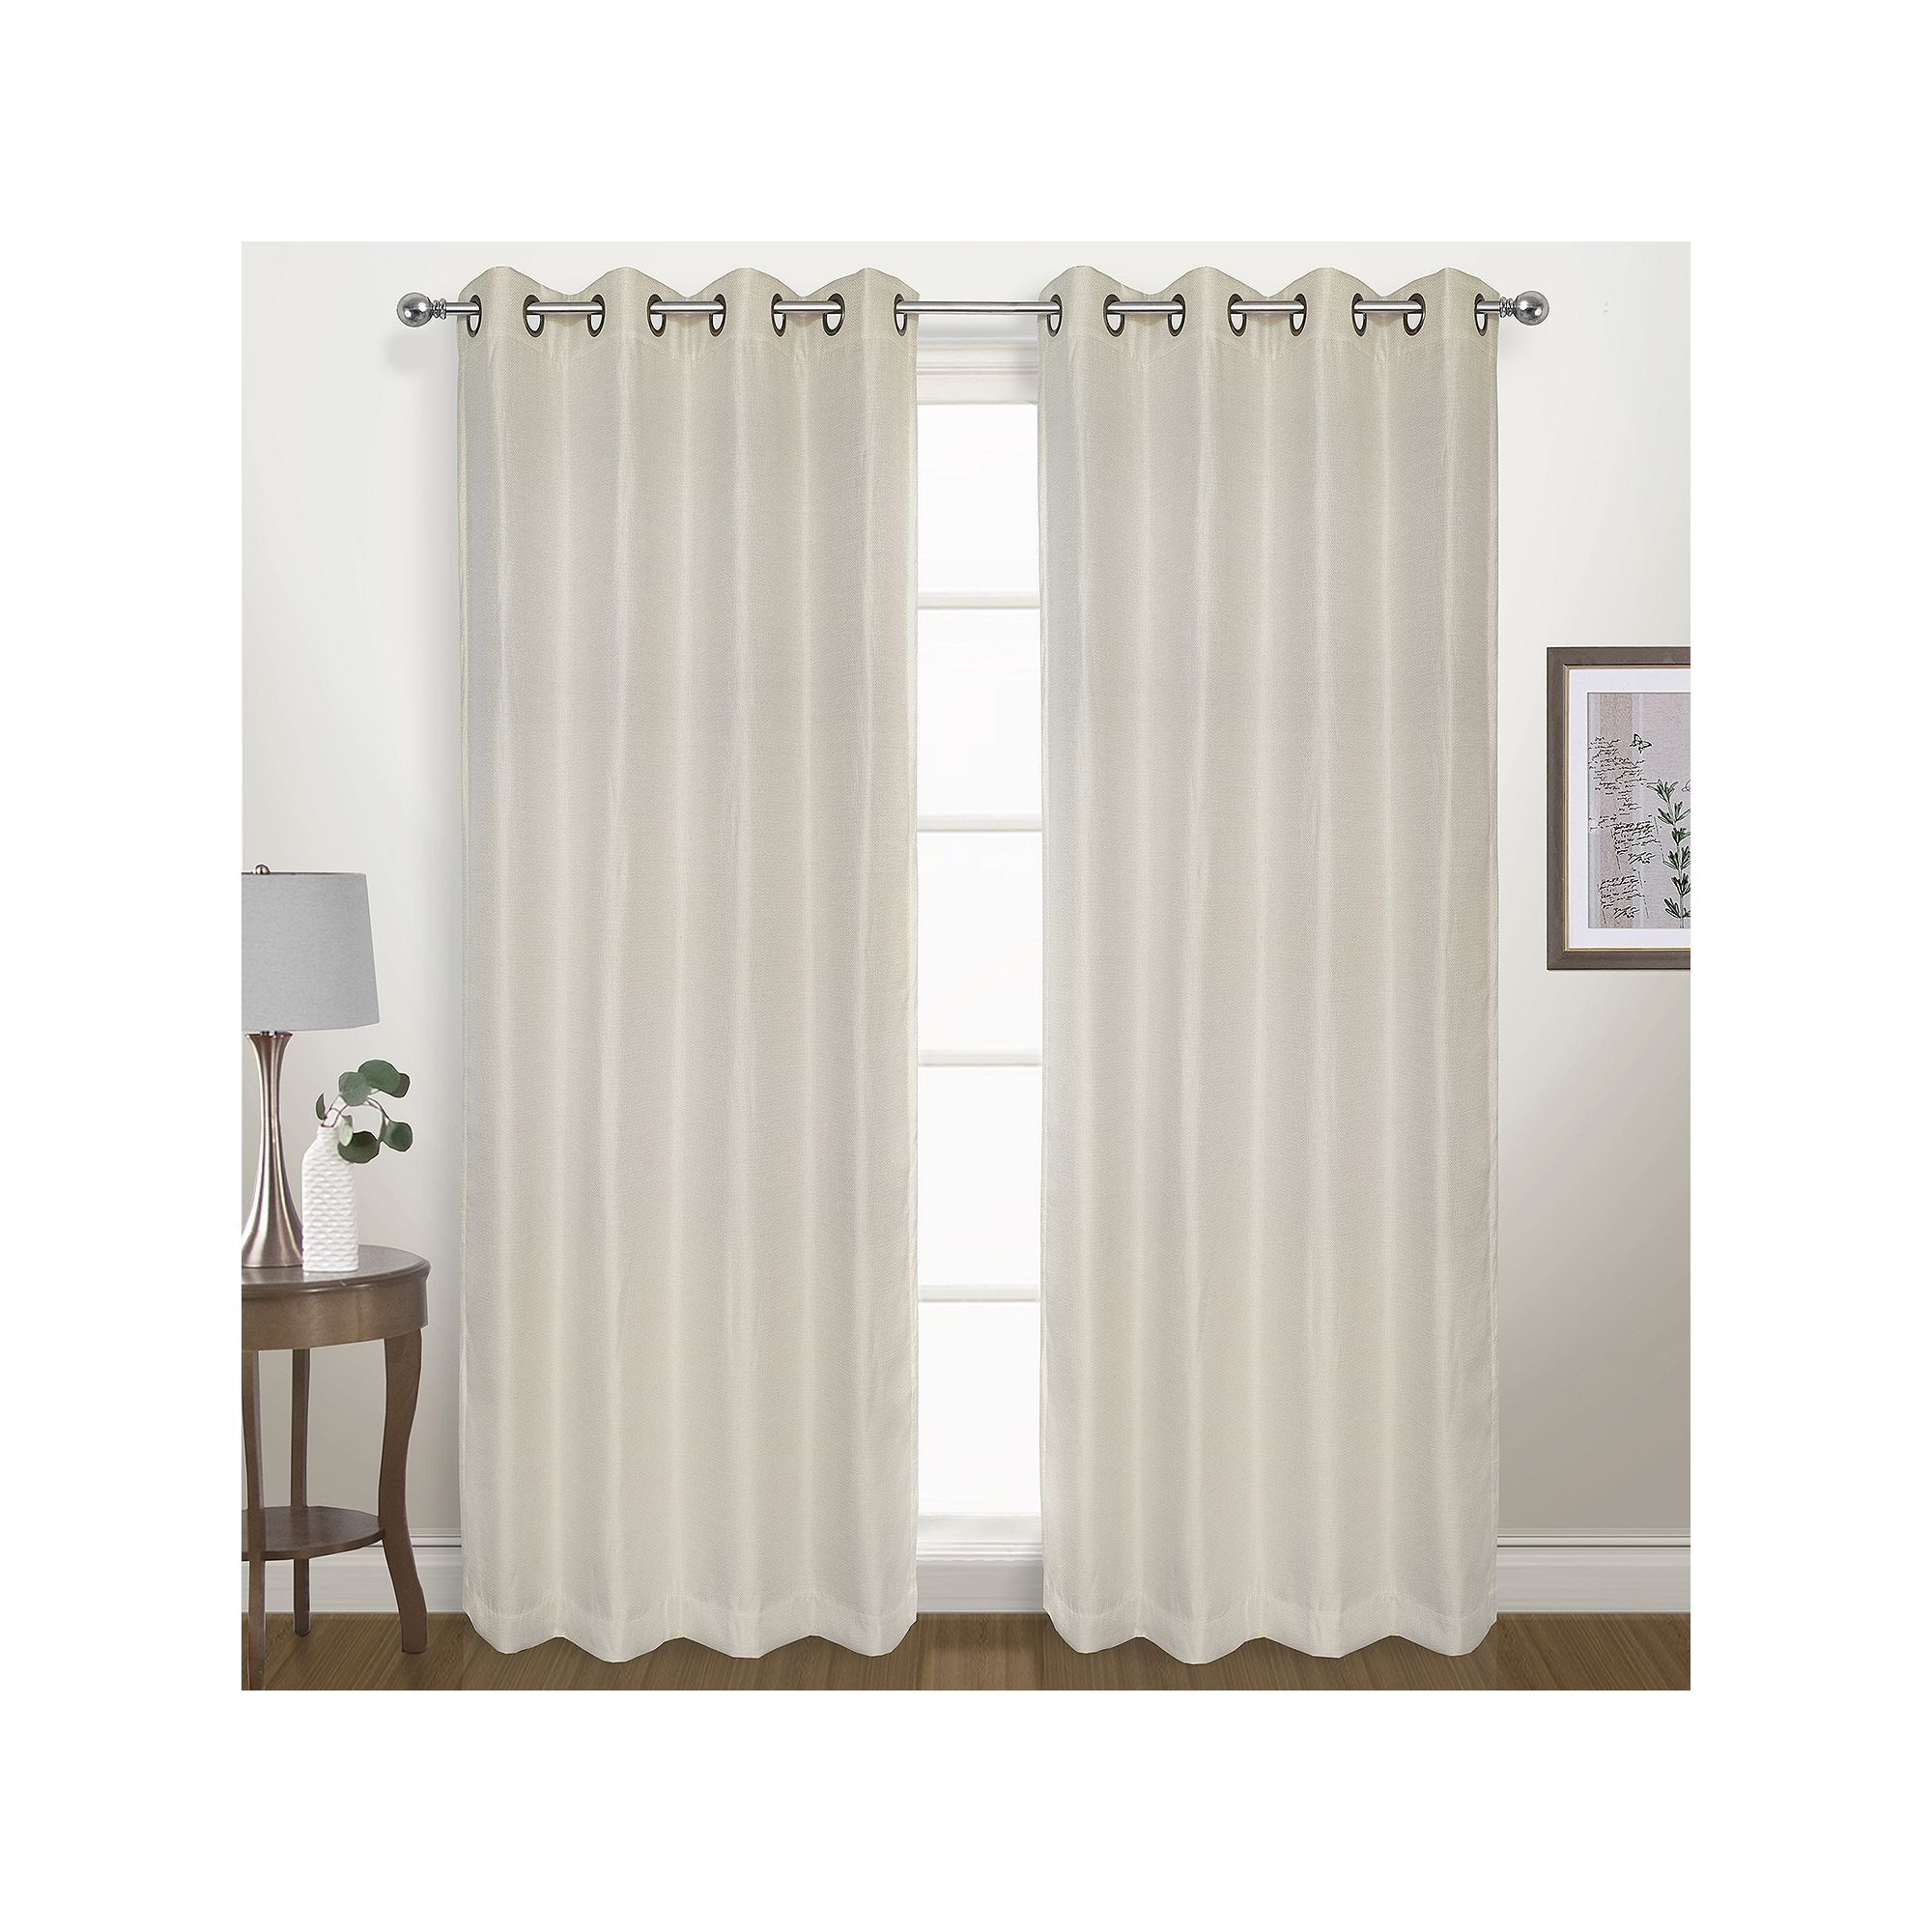 United Curtain Co Blackout 1 Panel Herringbone Window Curtain